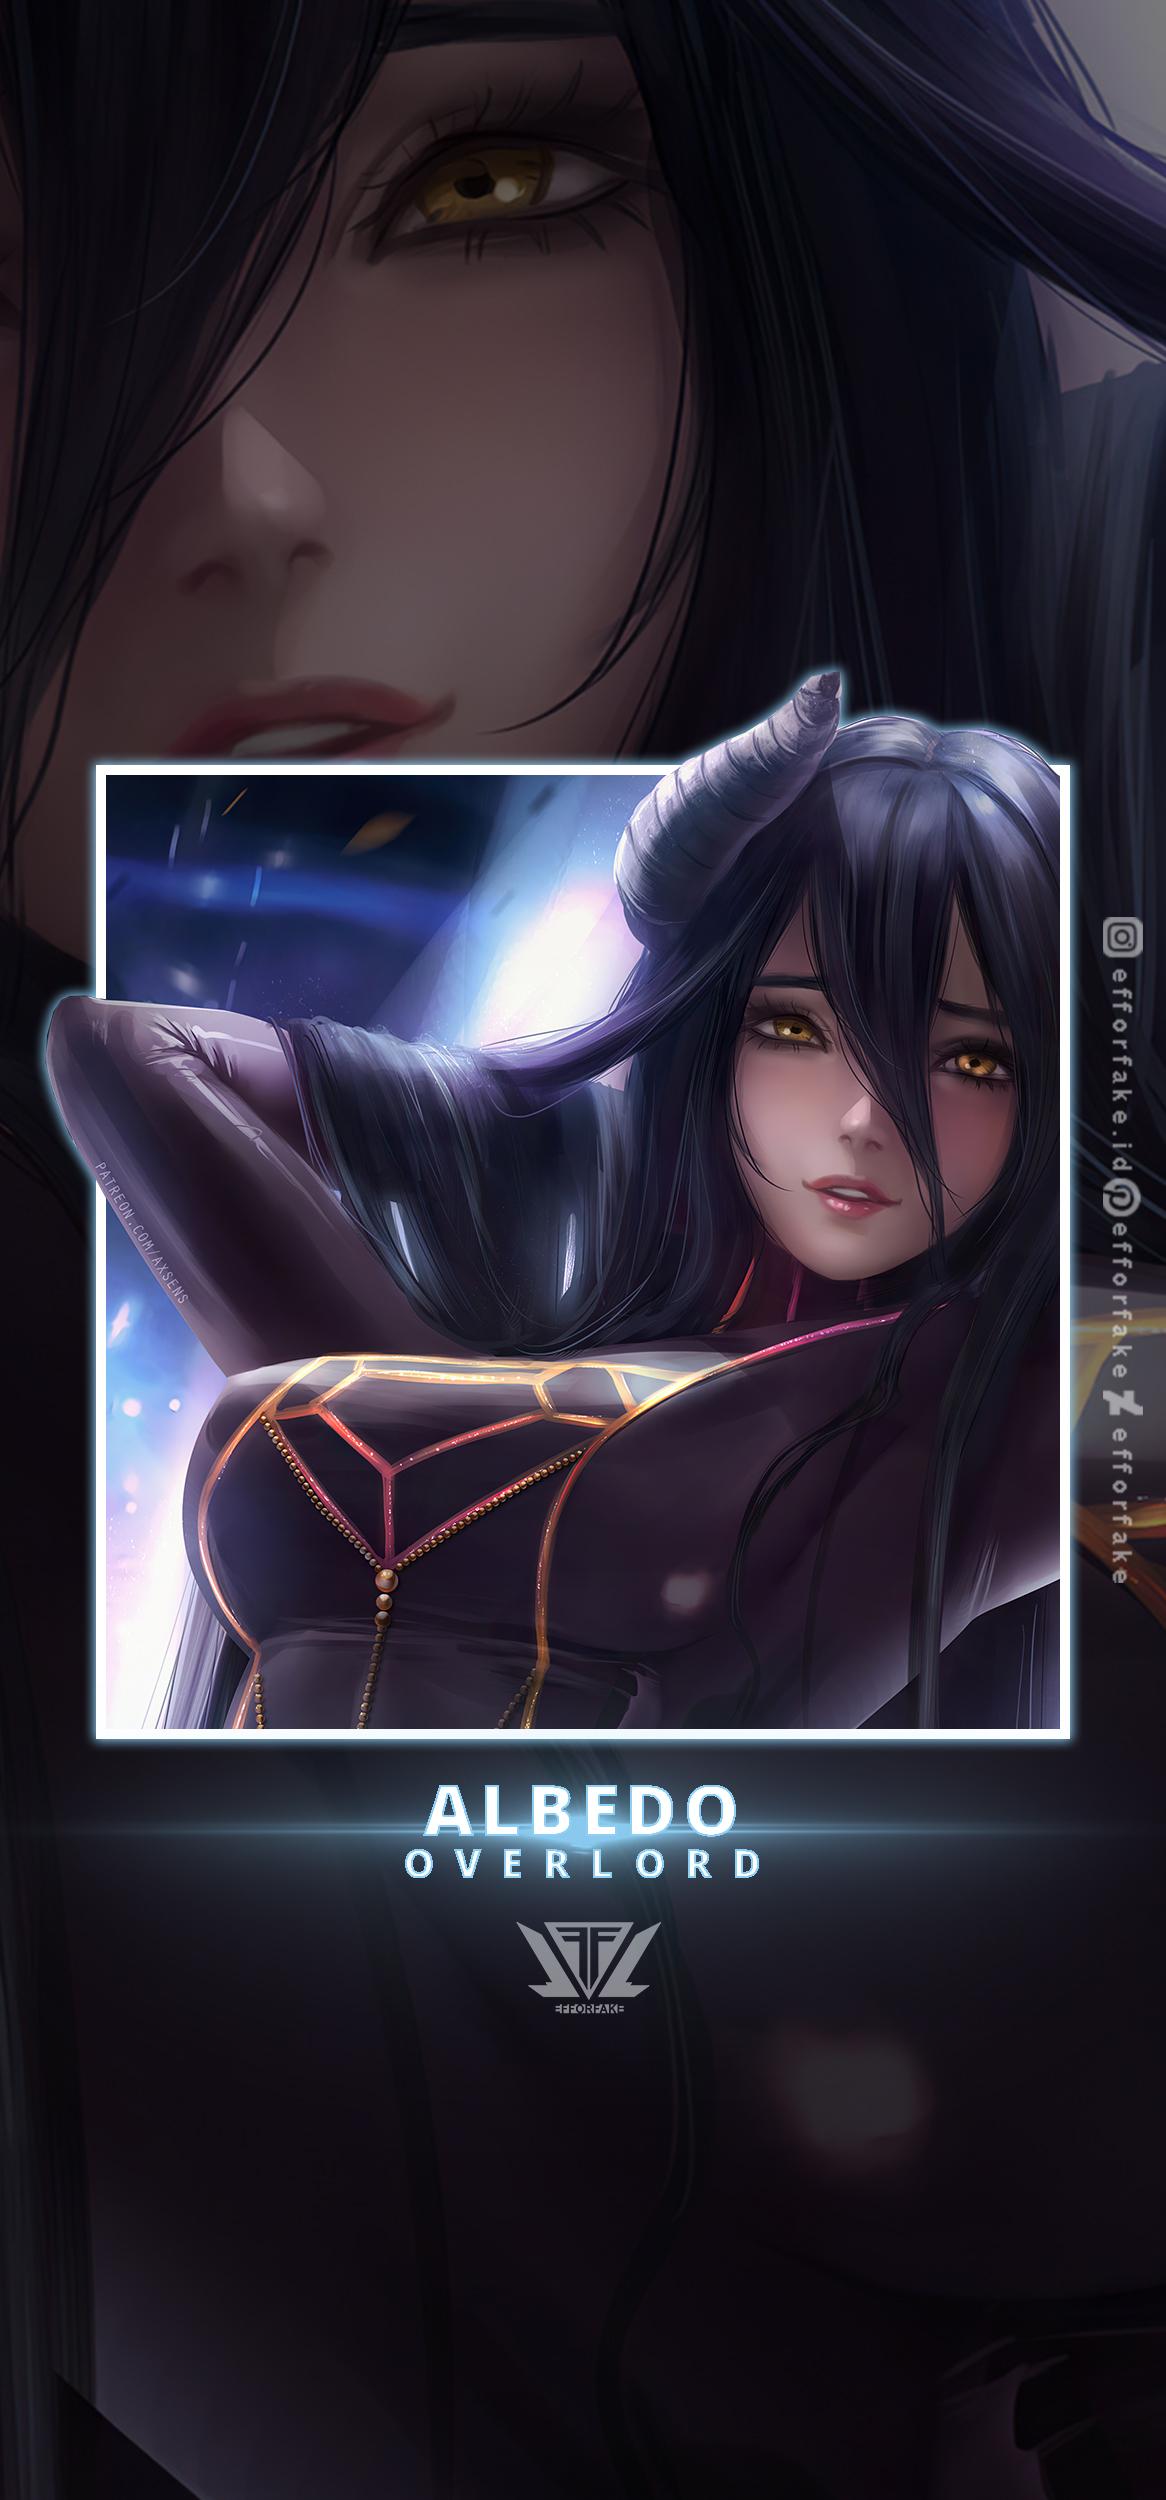 Albedo Overlord Wallpaper By Efforfake On Deviantart